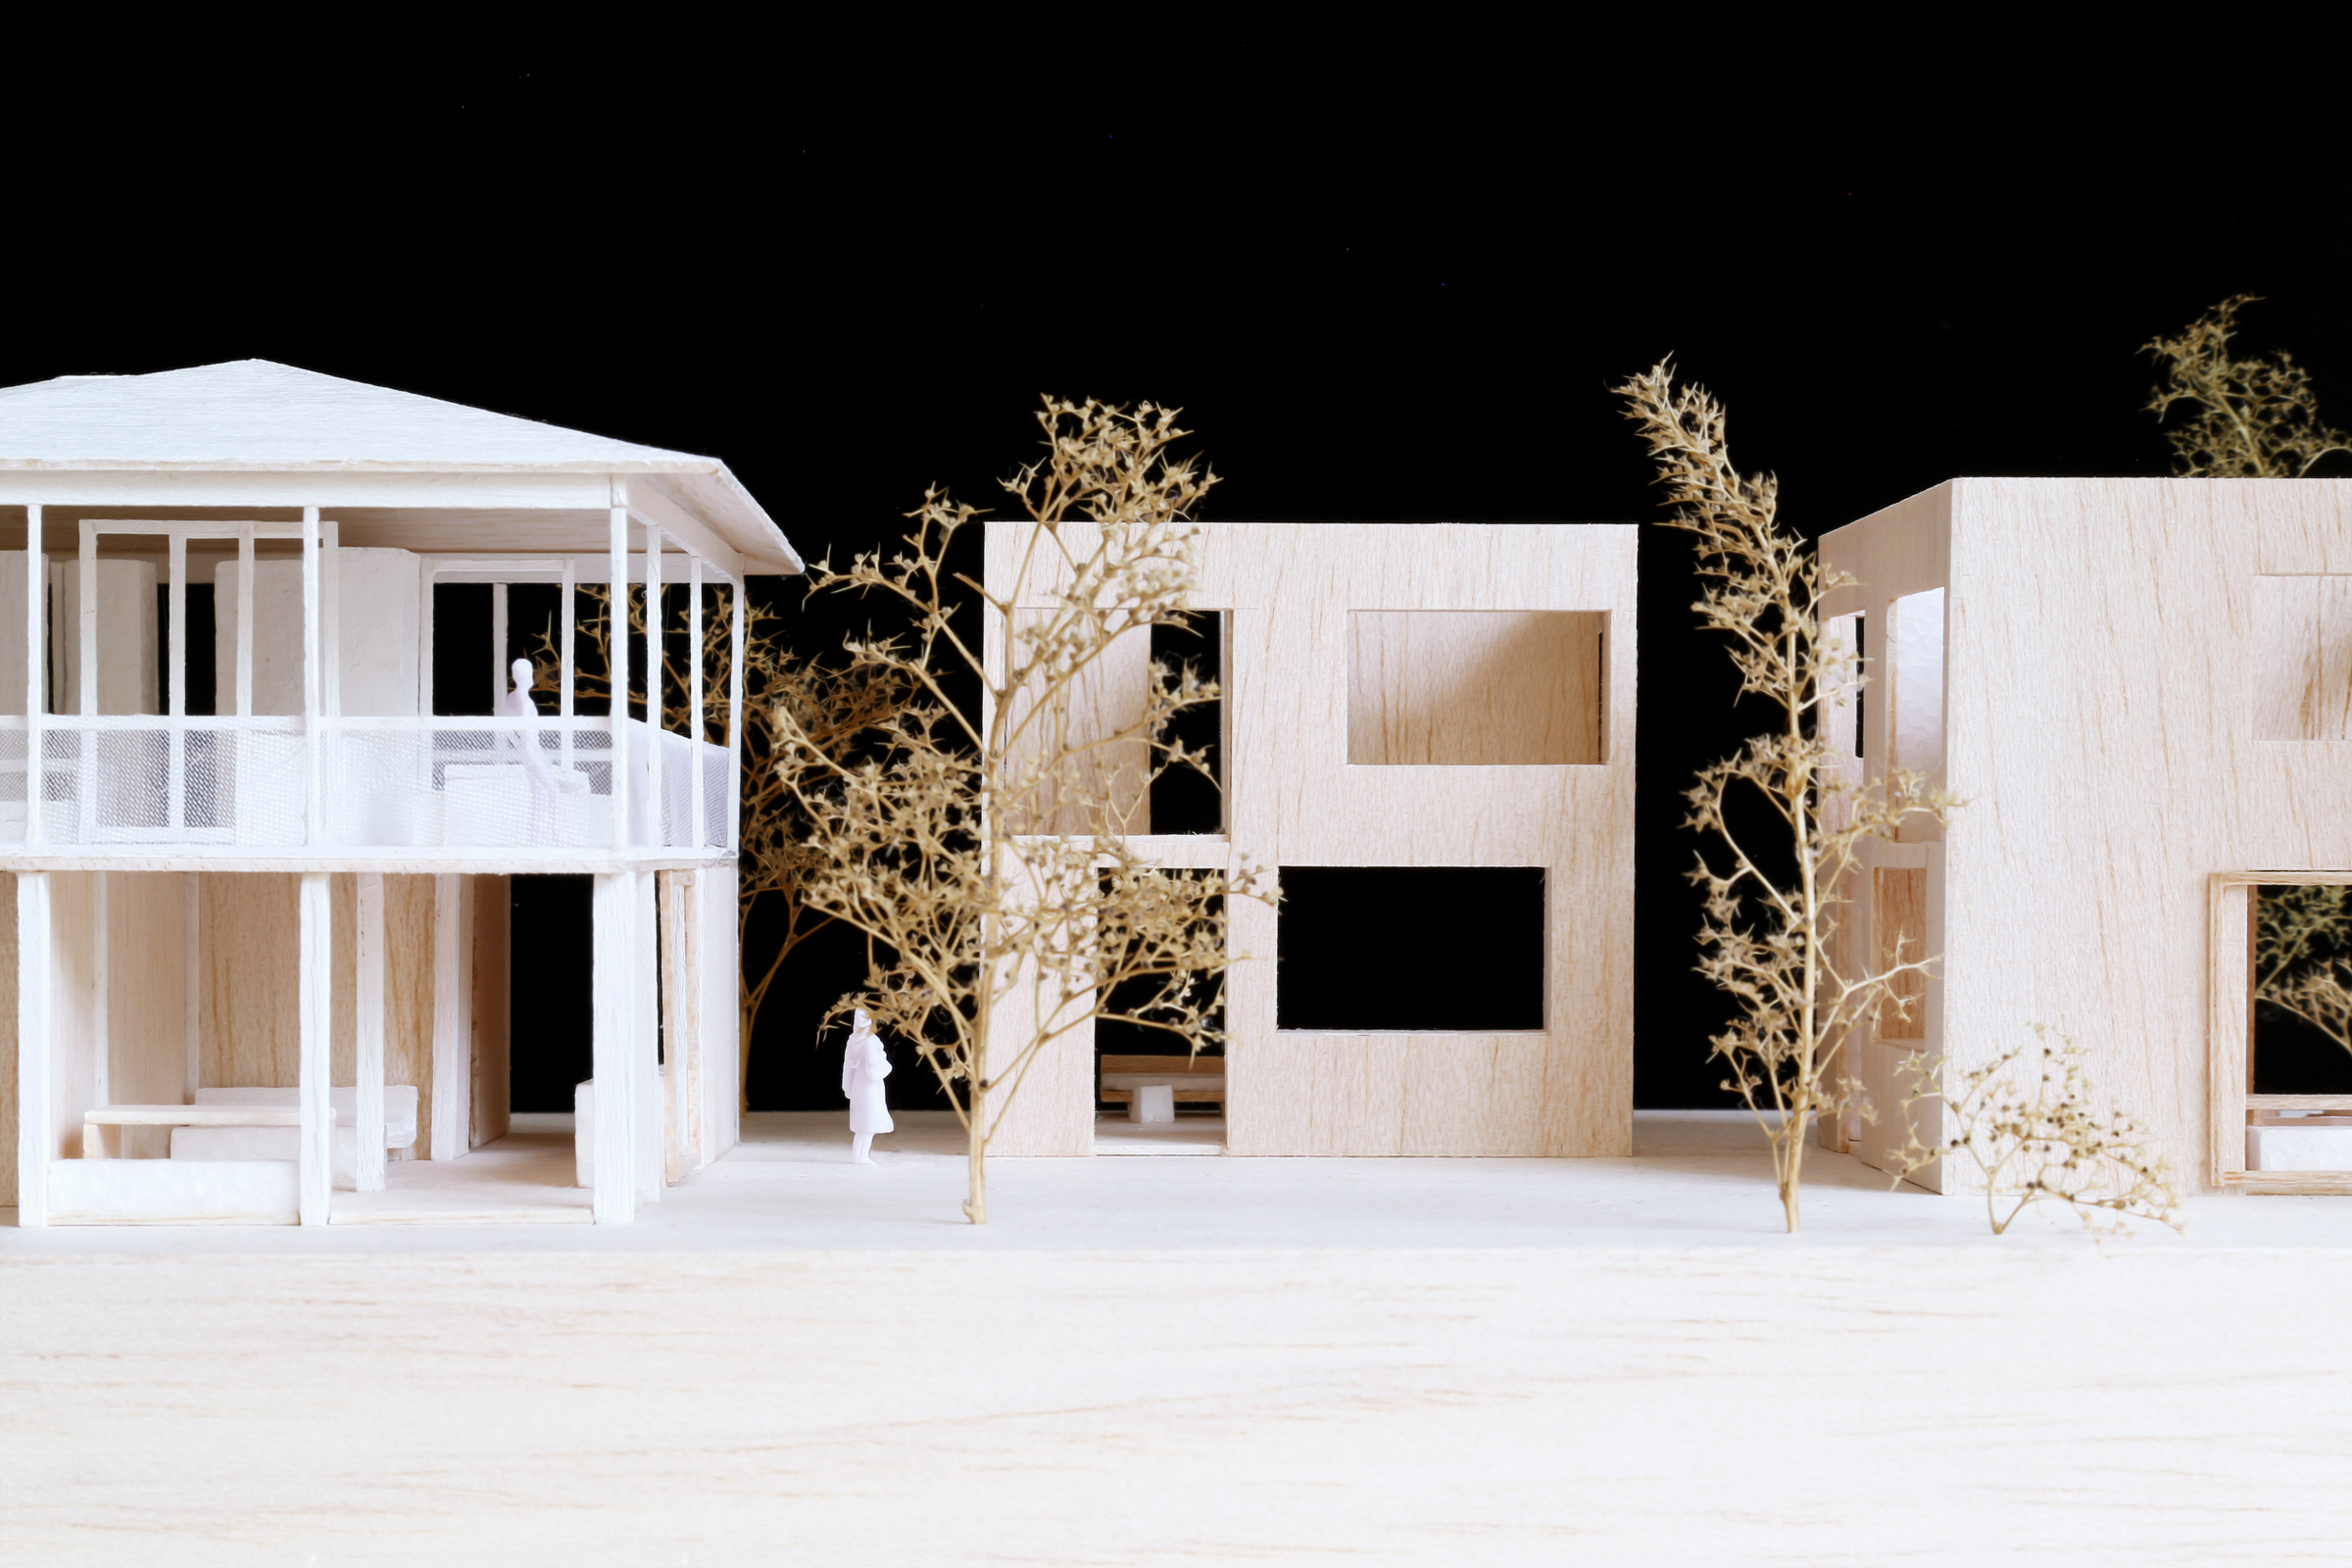 QUEENSLAND-RESIDENTIAL-ARCHITECT-TRIAS-STUDIO-QUEENSLAND-HOUSE-M05